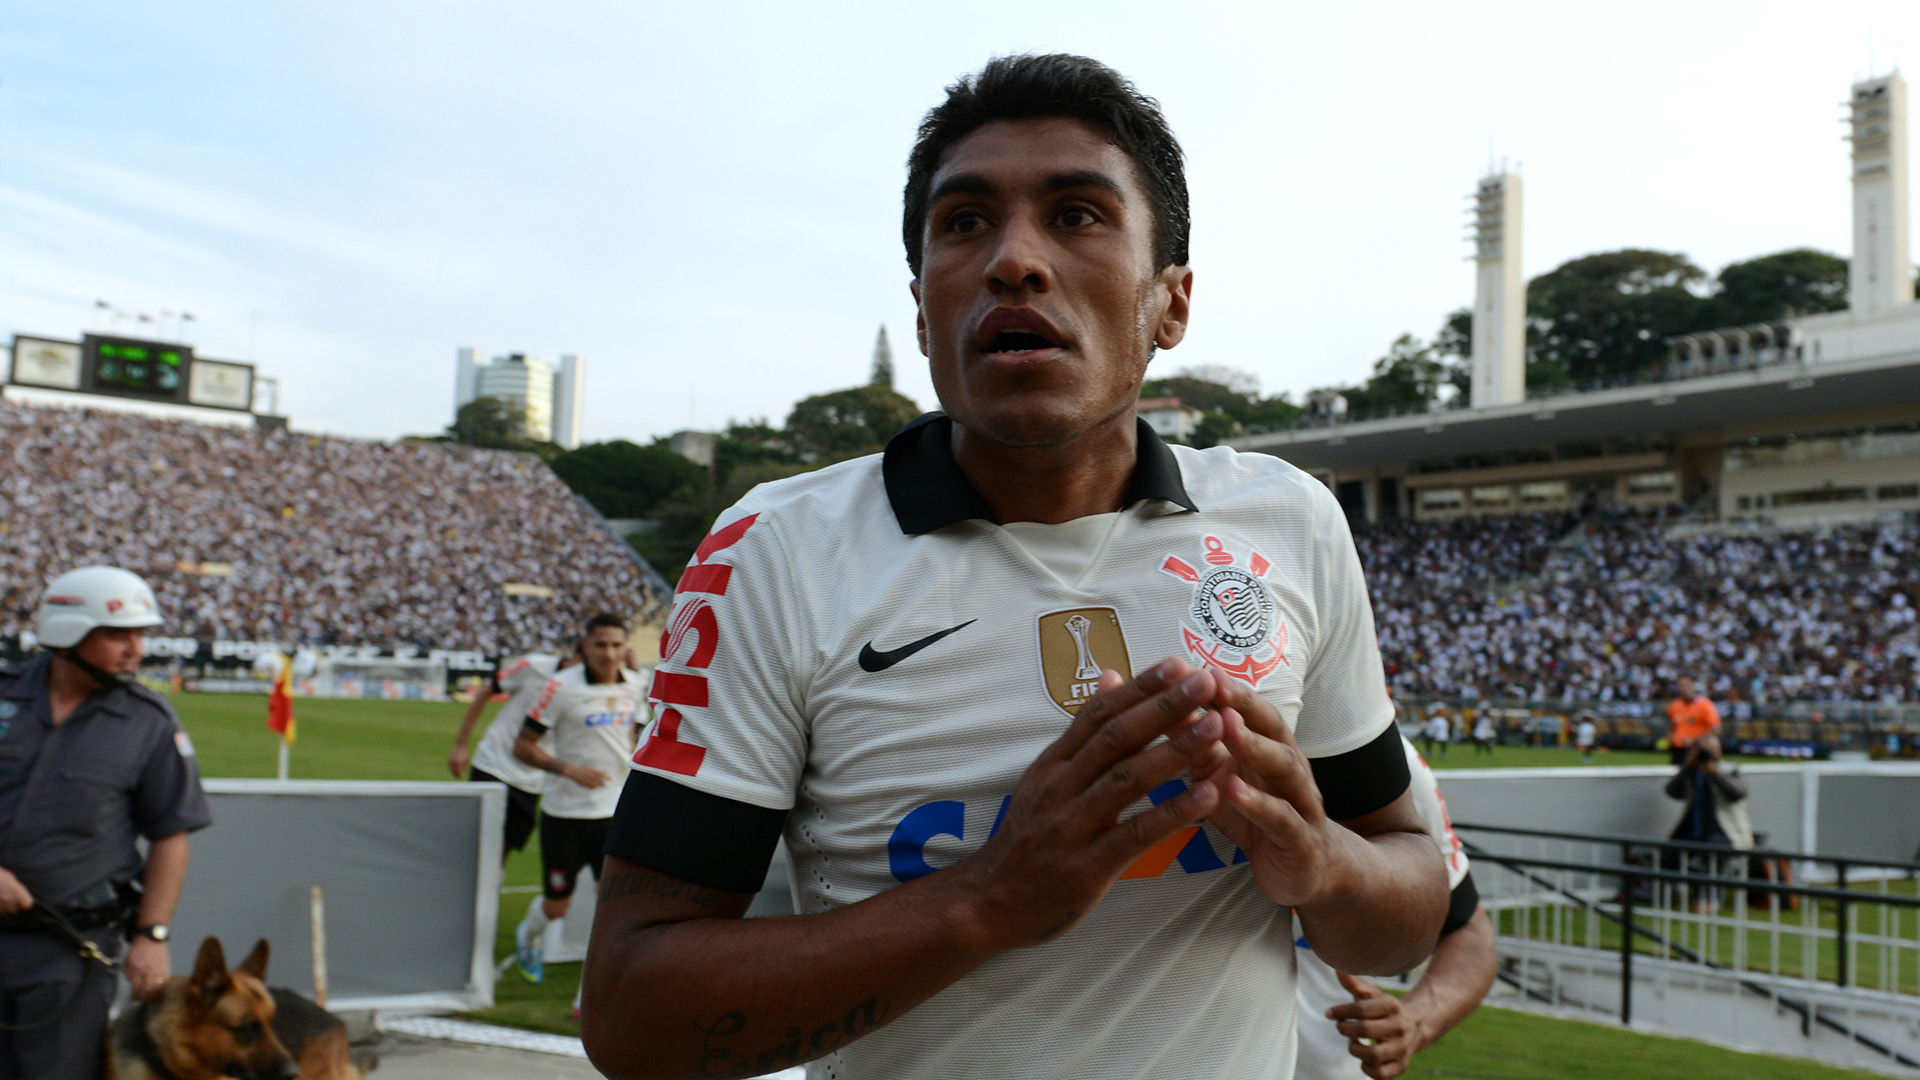 HD Paulinho Corinthians 2013